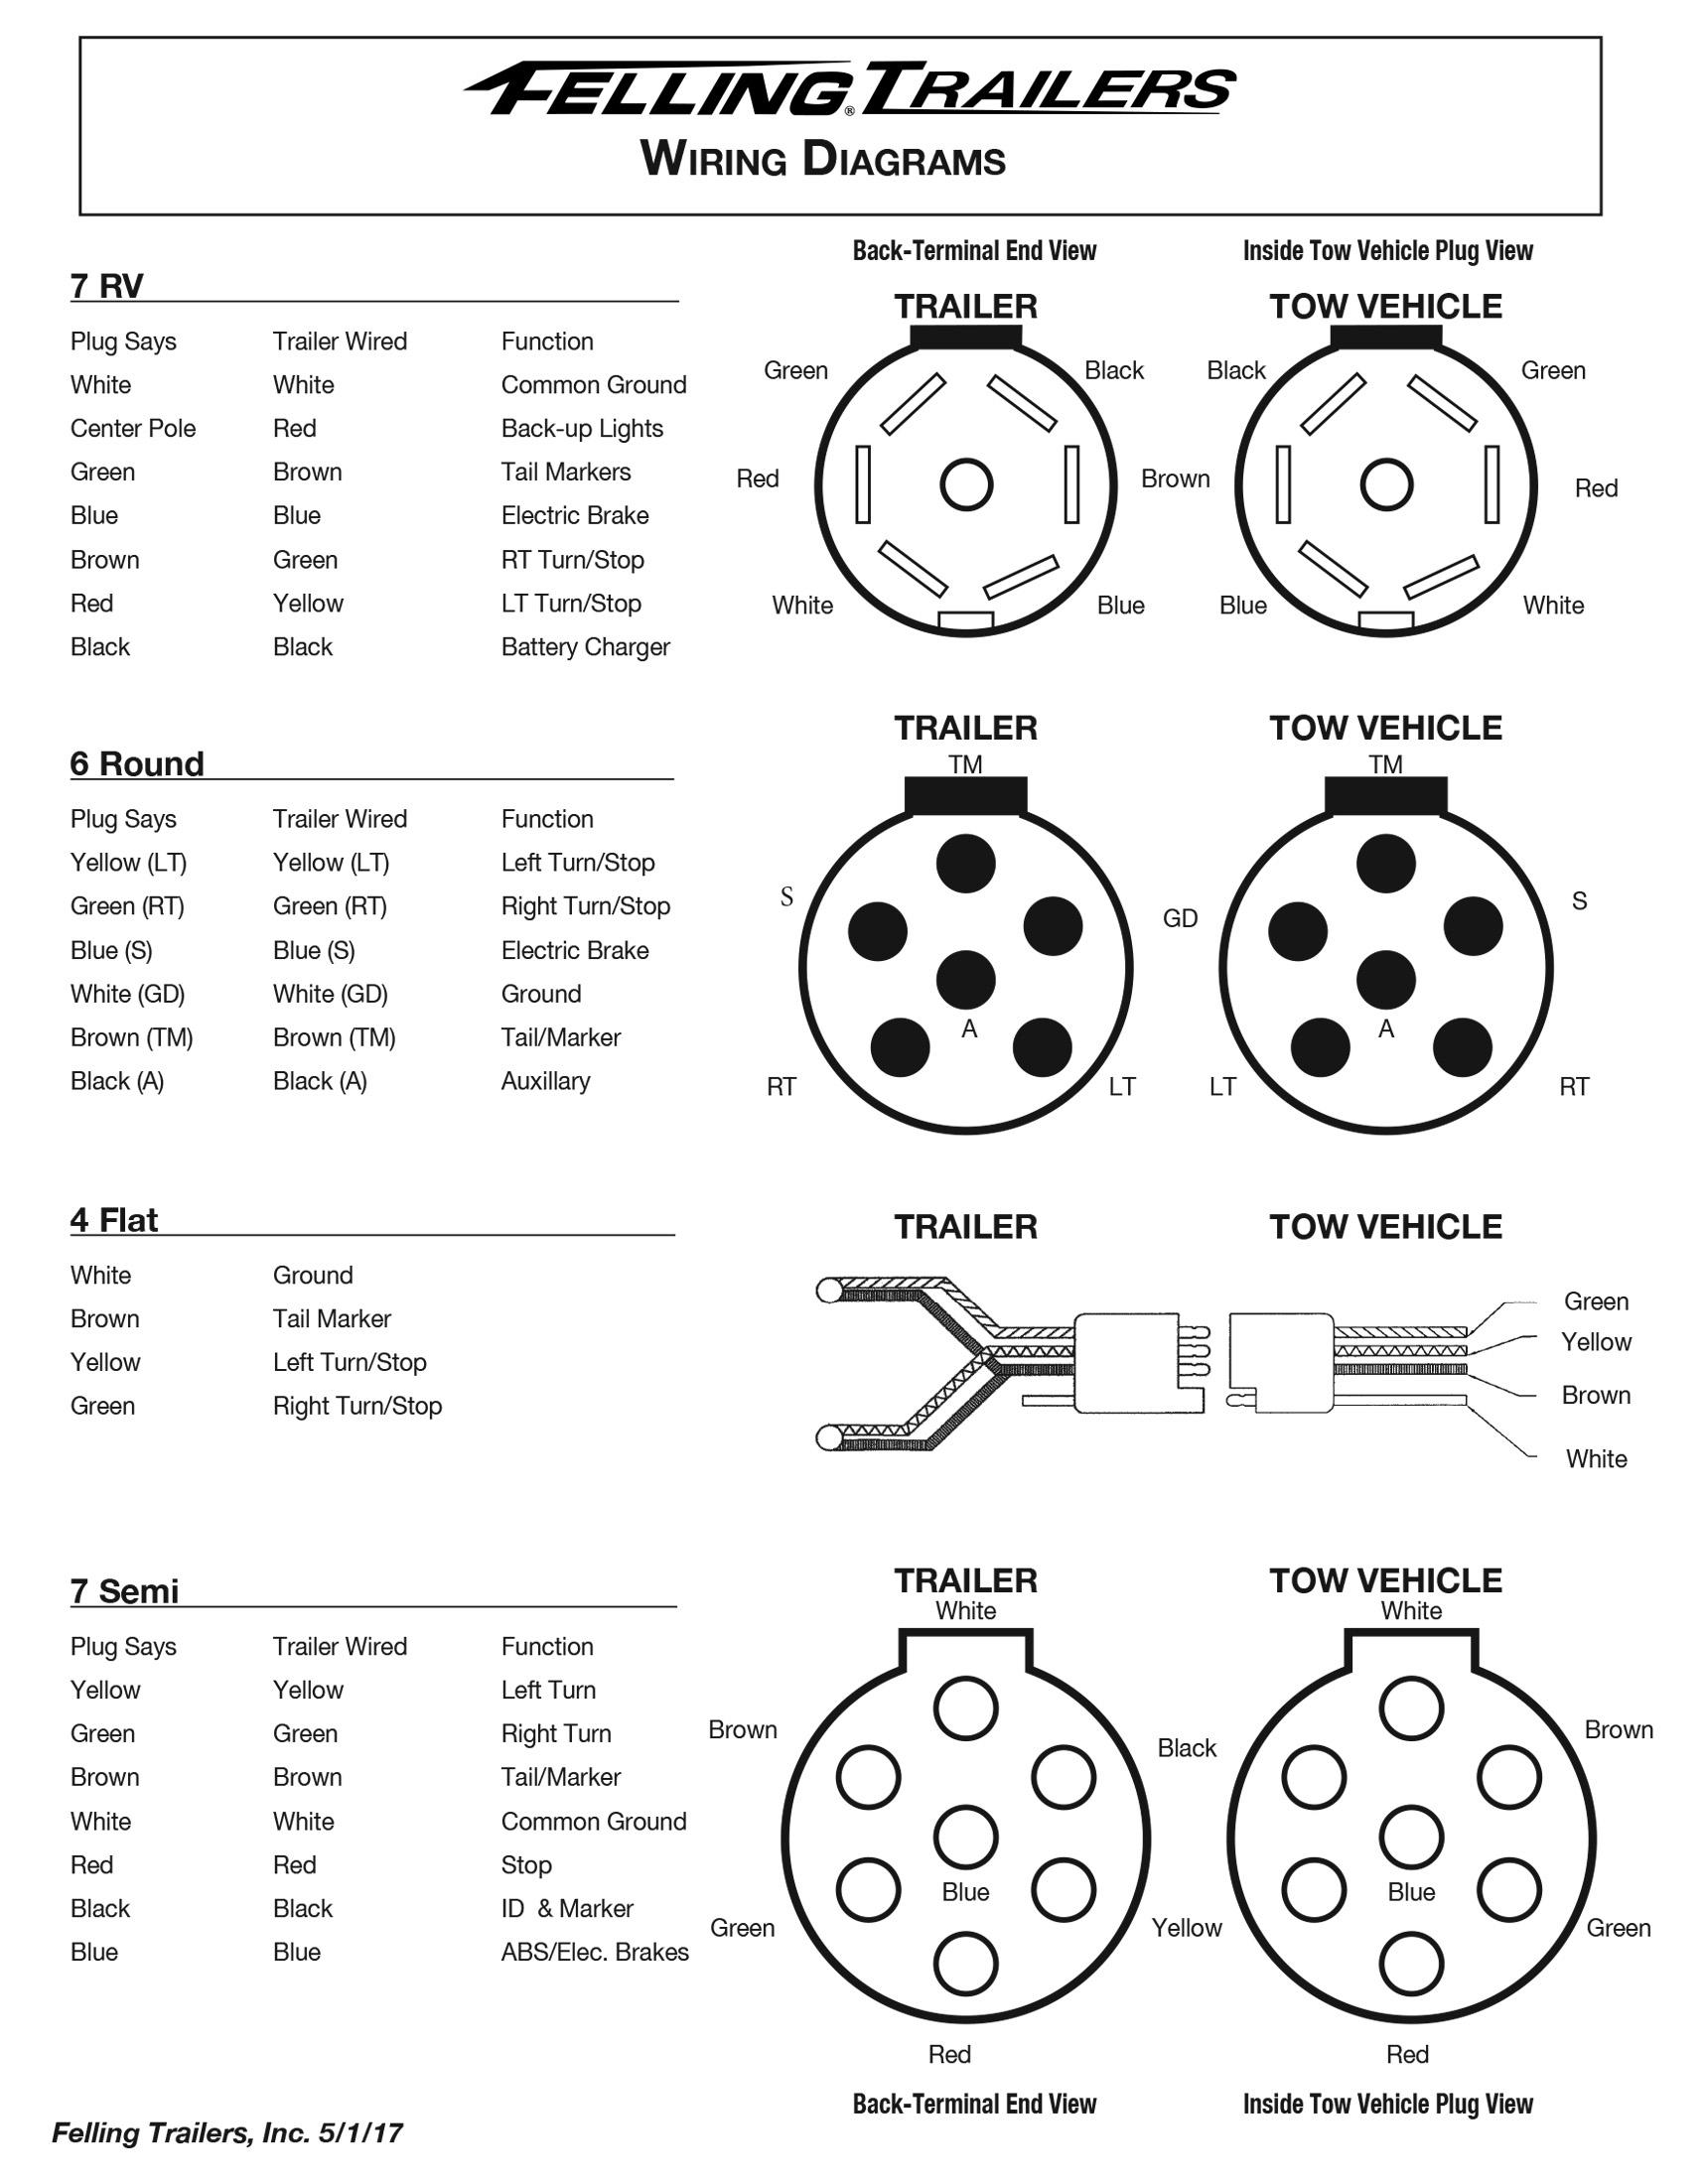 Service- Felling Trailers Wiring Diagrams, Wheel Toque - 7 Way Trailer Plug Wiring Diagram